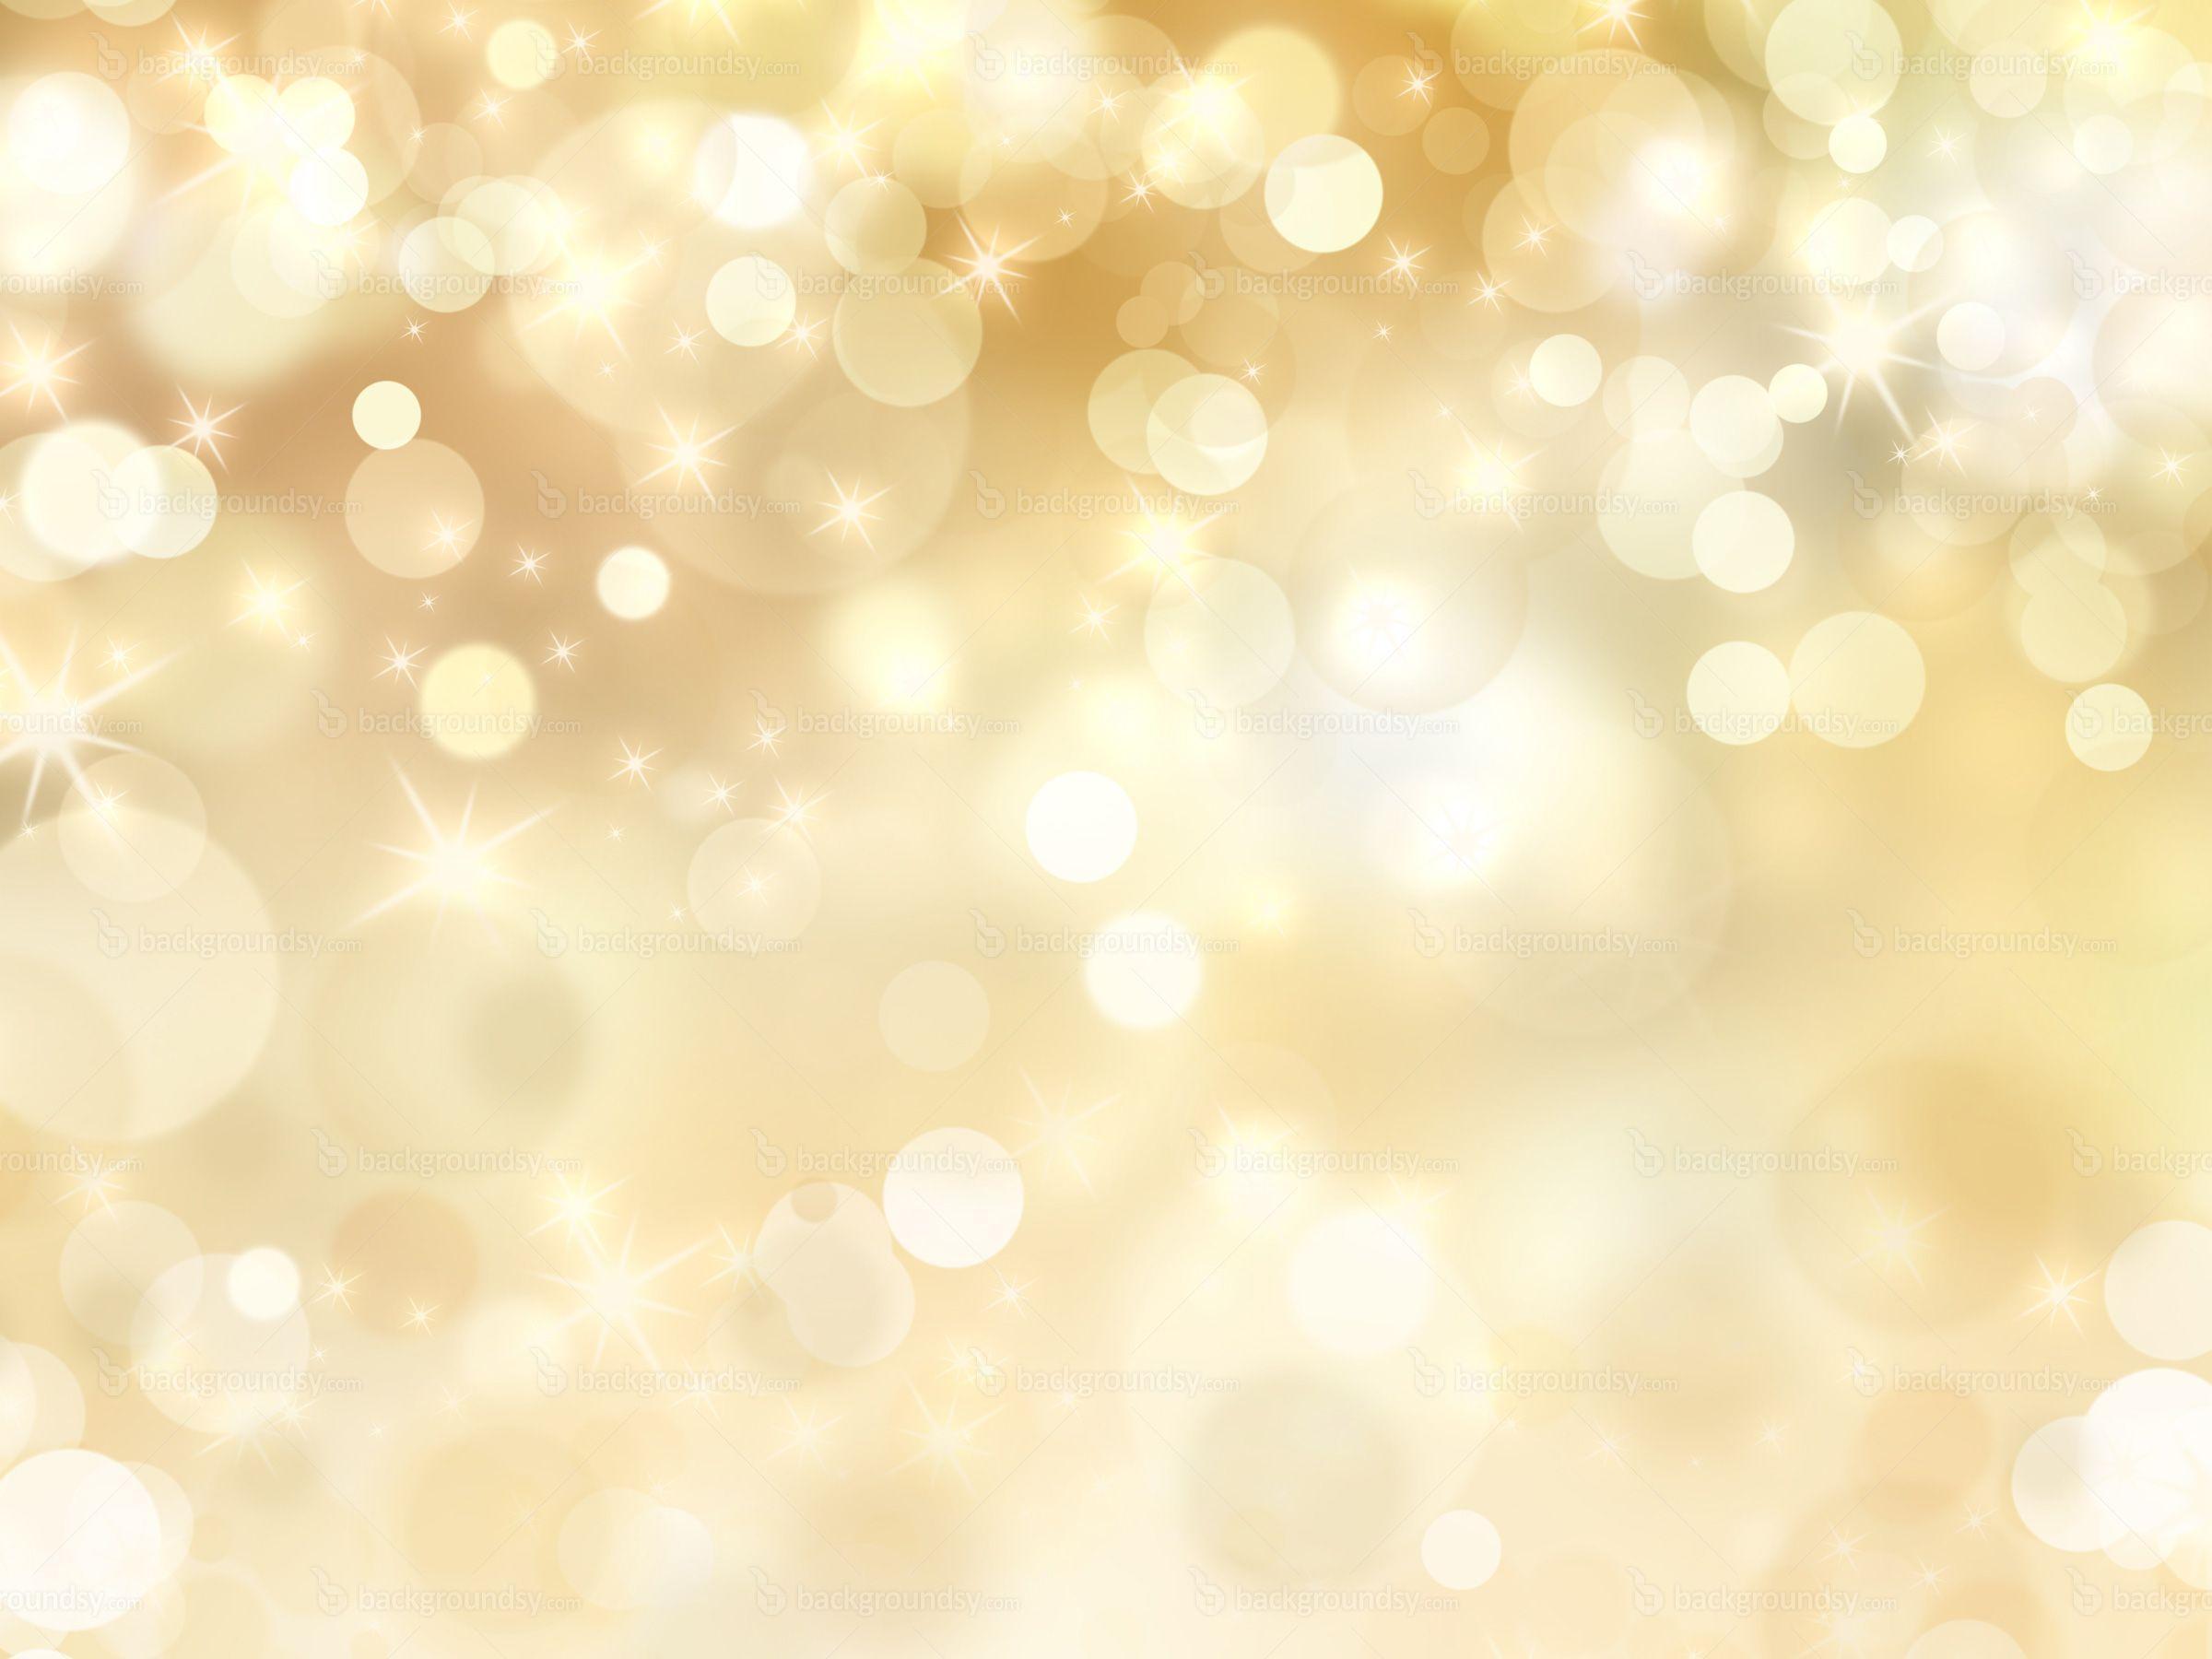 Christmas Lights Backgrounds 2400x1800